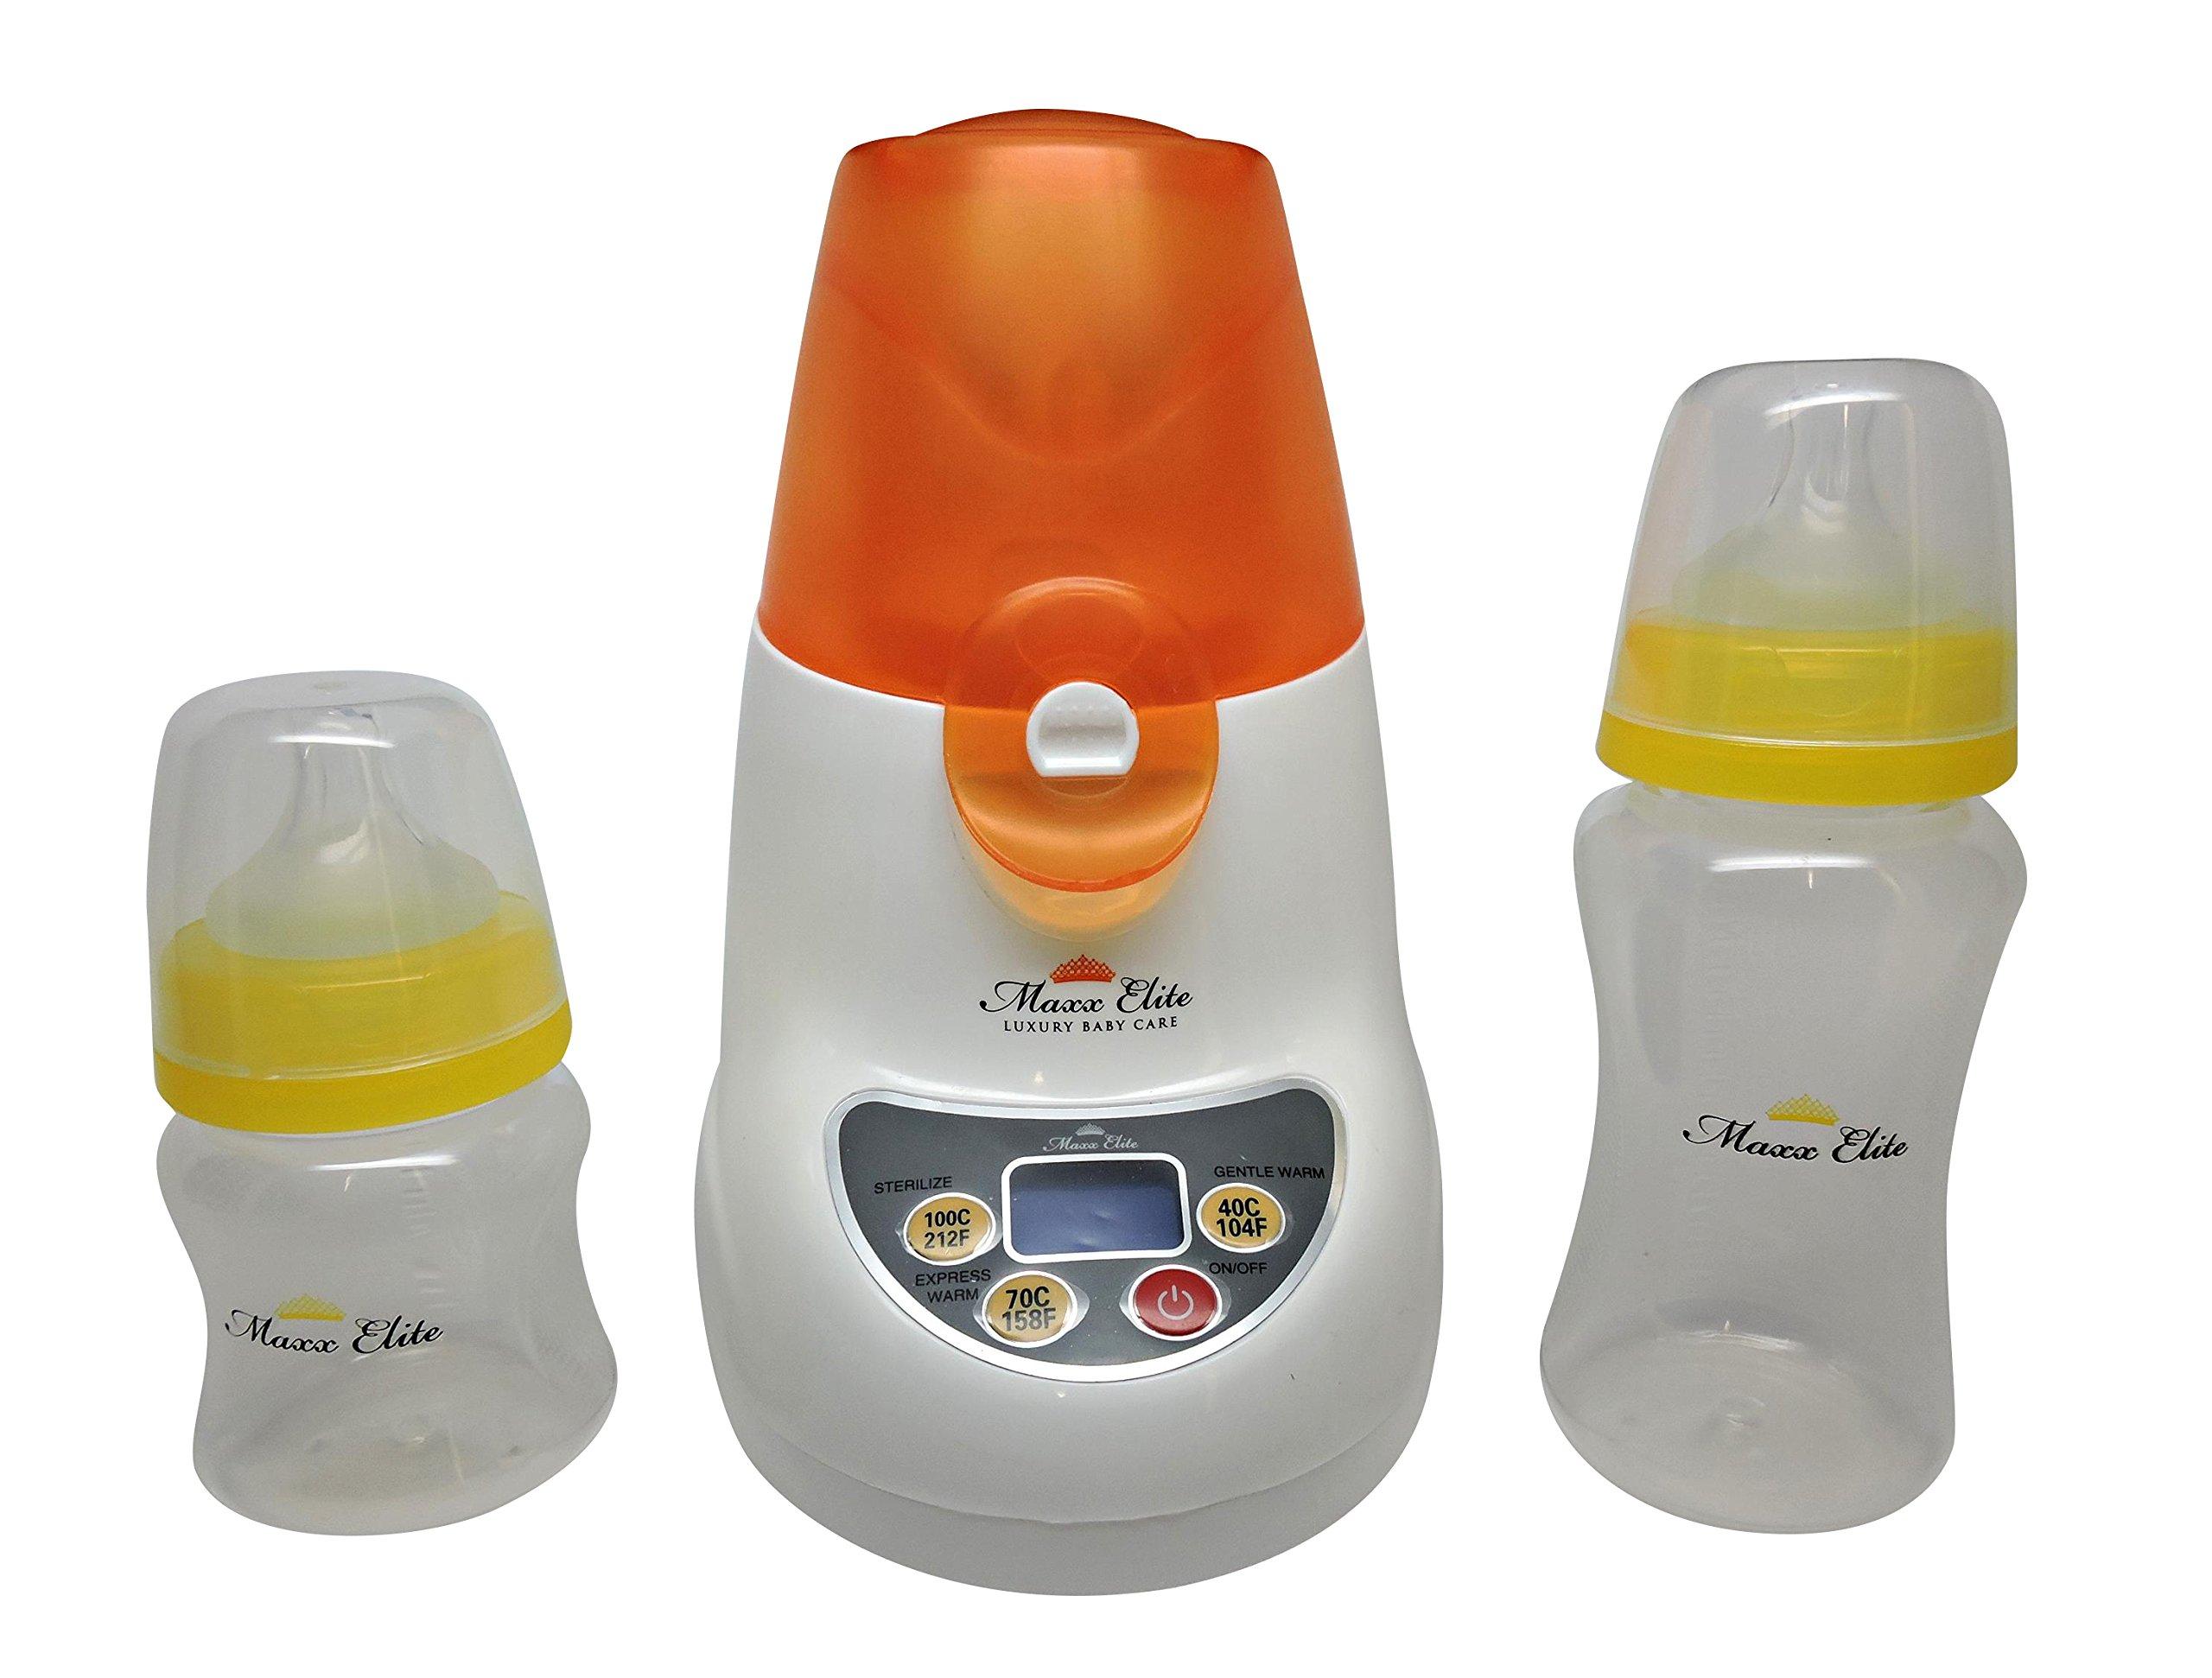 Maxx Elite ''Digital Gentle Warm'' Bottle Warmer & Sterilizer w/''Steady Warm'' and LCD Display (Orange) by Maxx Elite (Image #2)